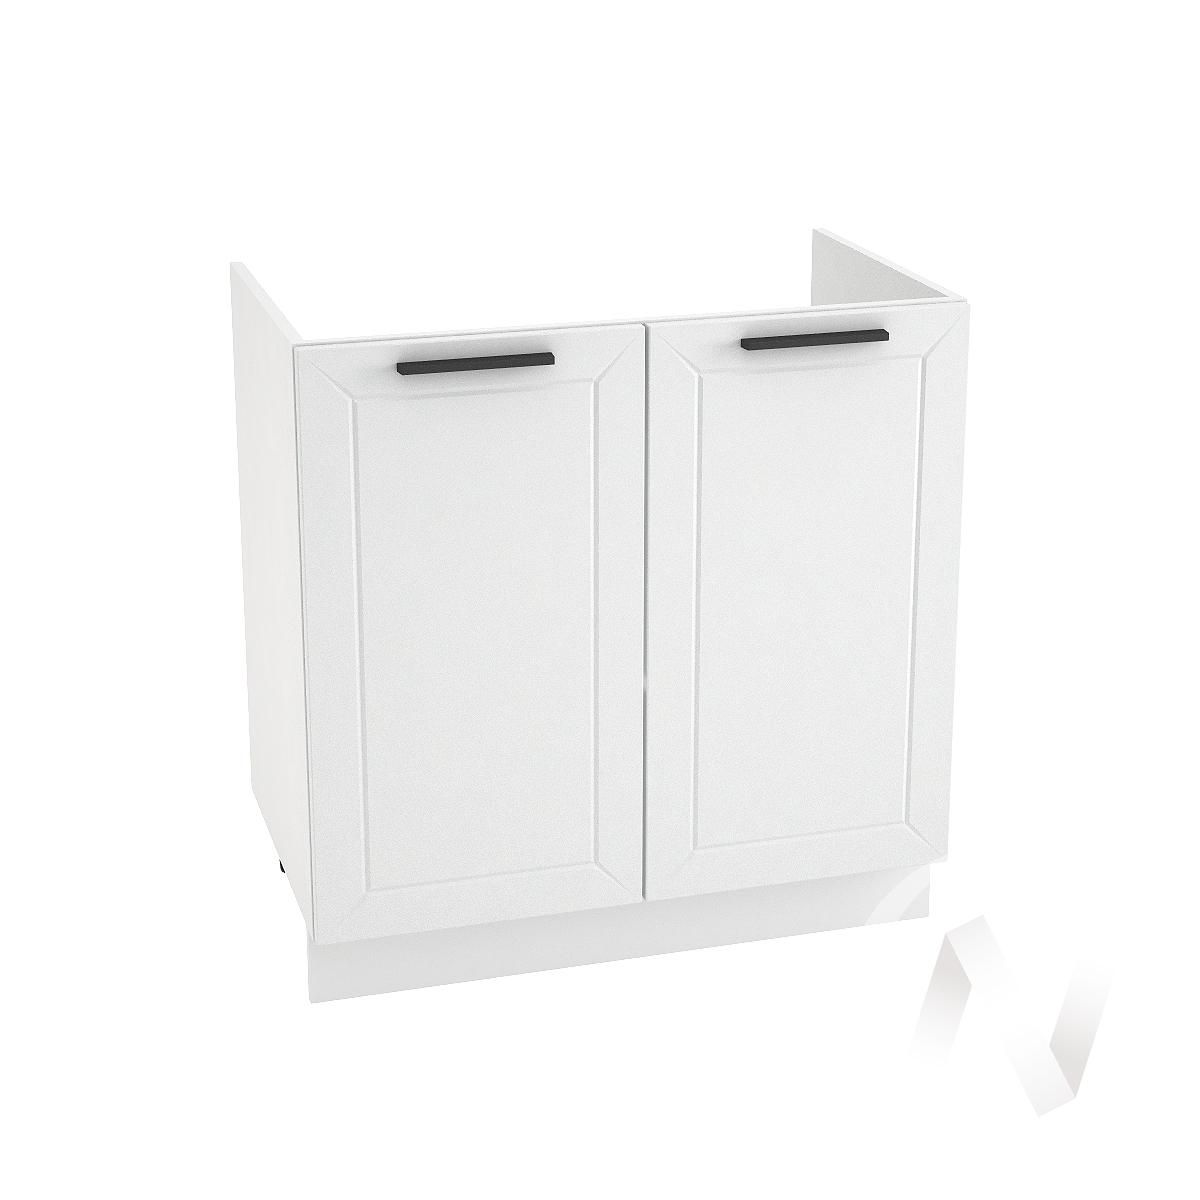 "Кухня ""Глетчер"": Шкаф нижний под мойку 800, ШНМ 800 (Айленд Силк/корпус белый)"